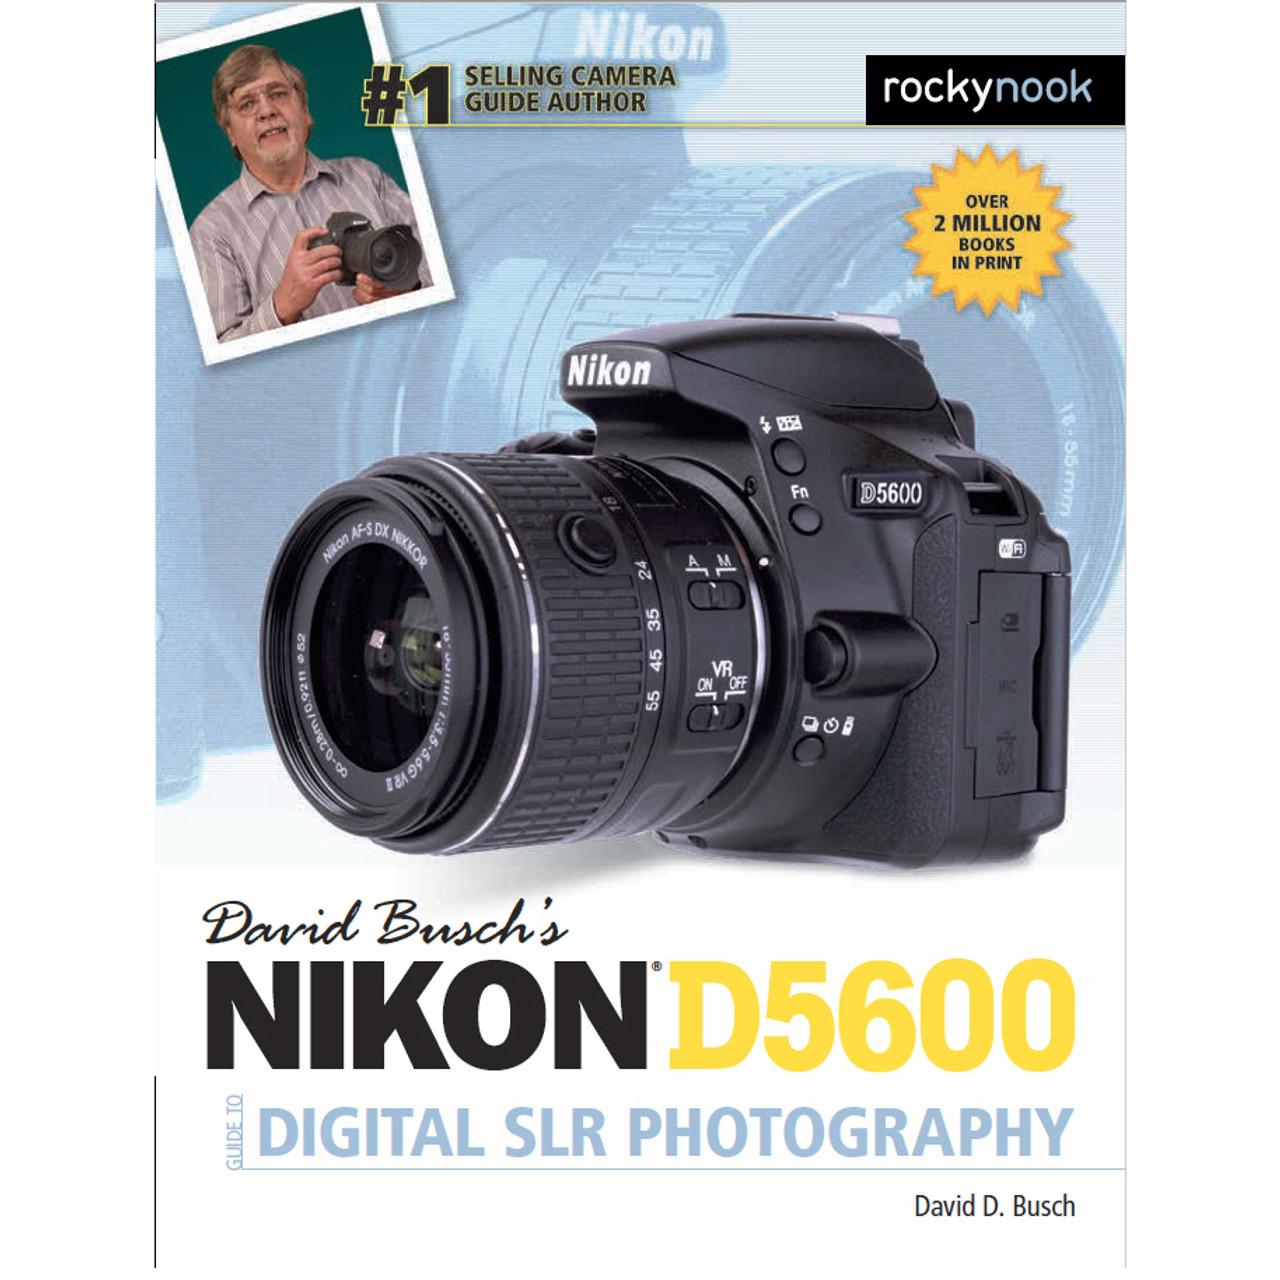 DAVID BUSCH'S NIKON D5600 GUIDE BOOK